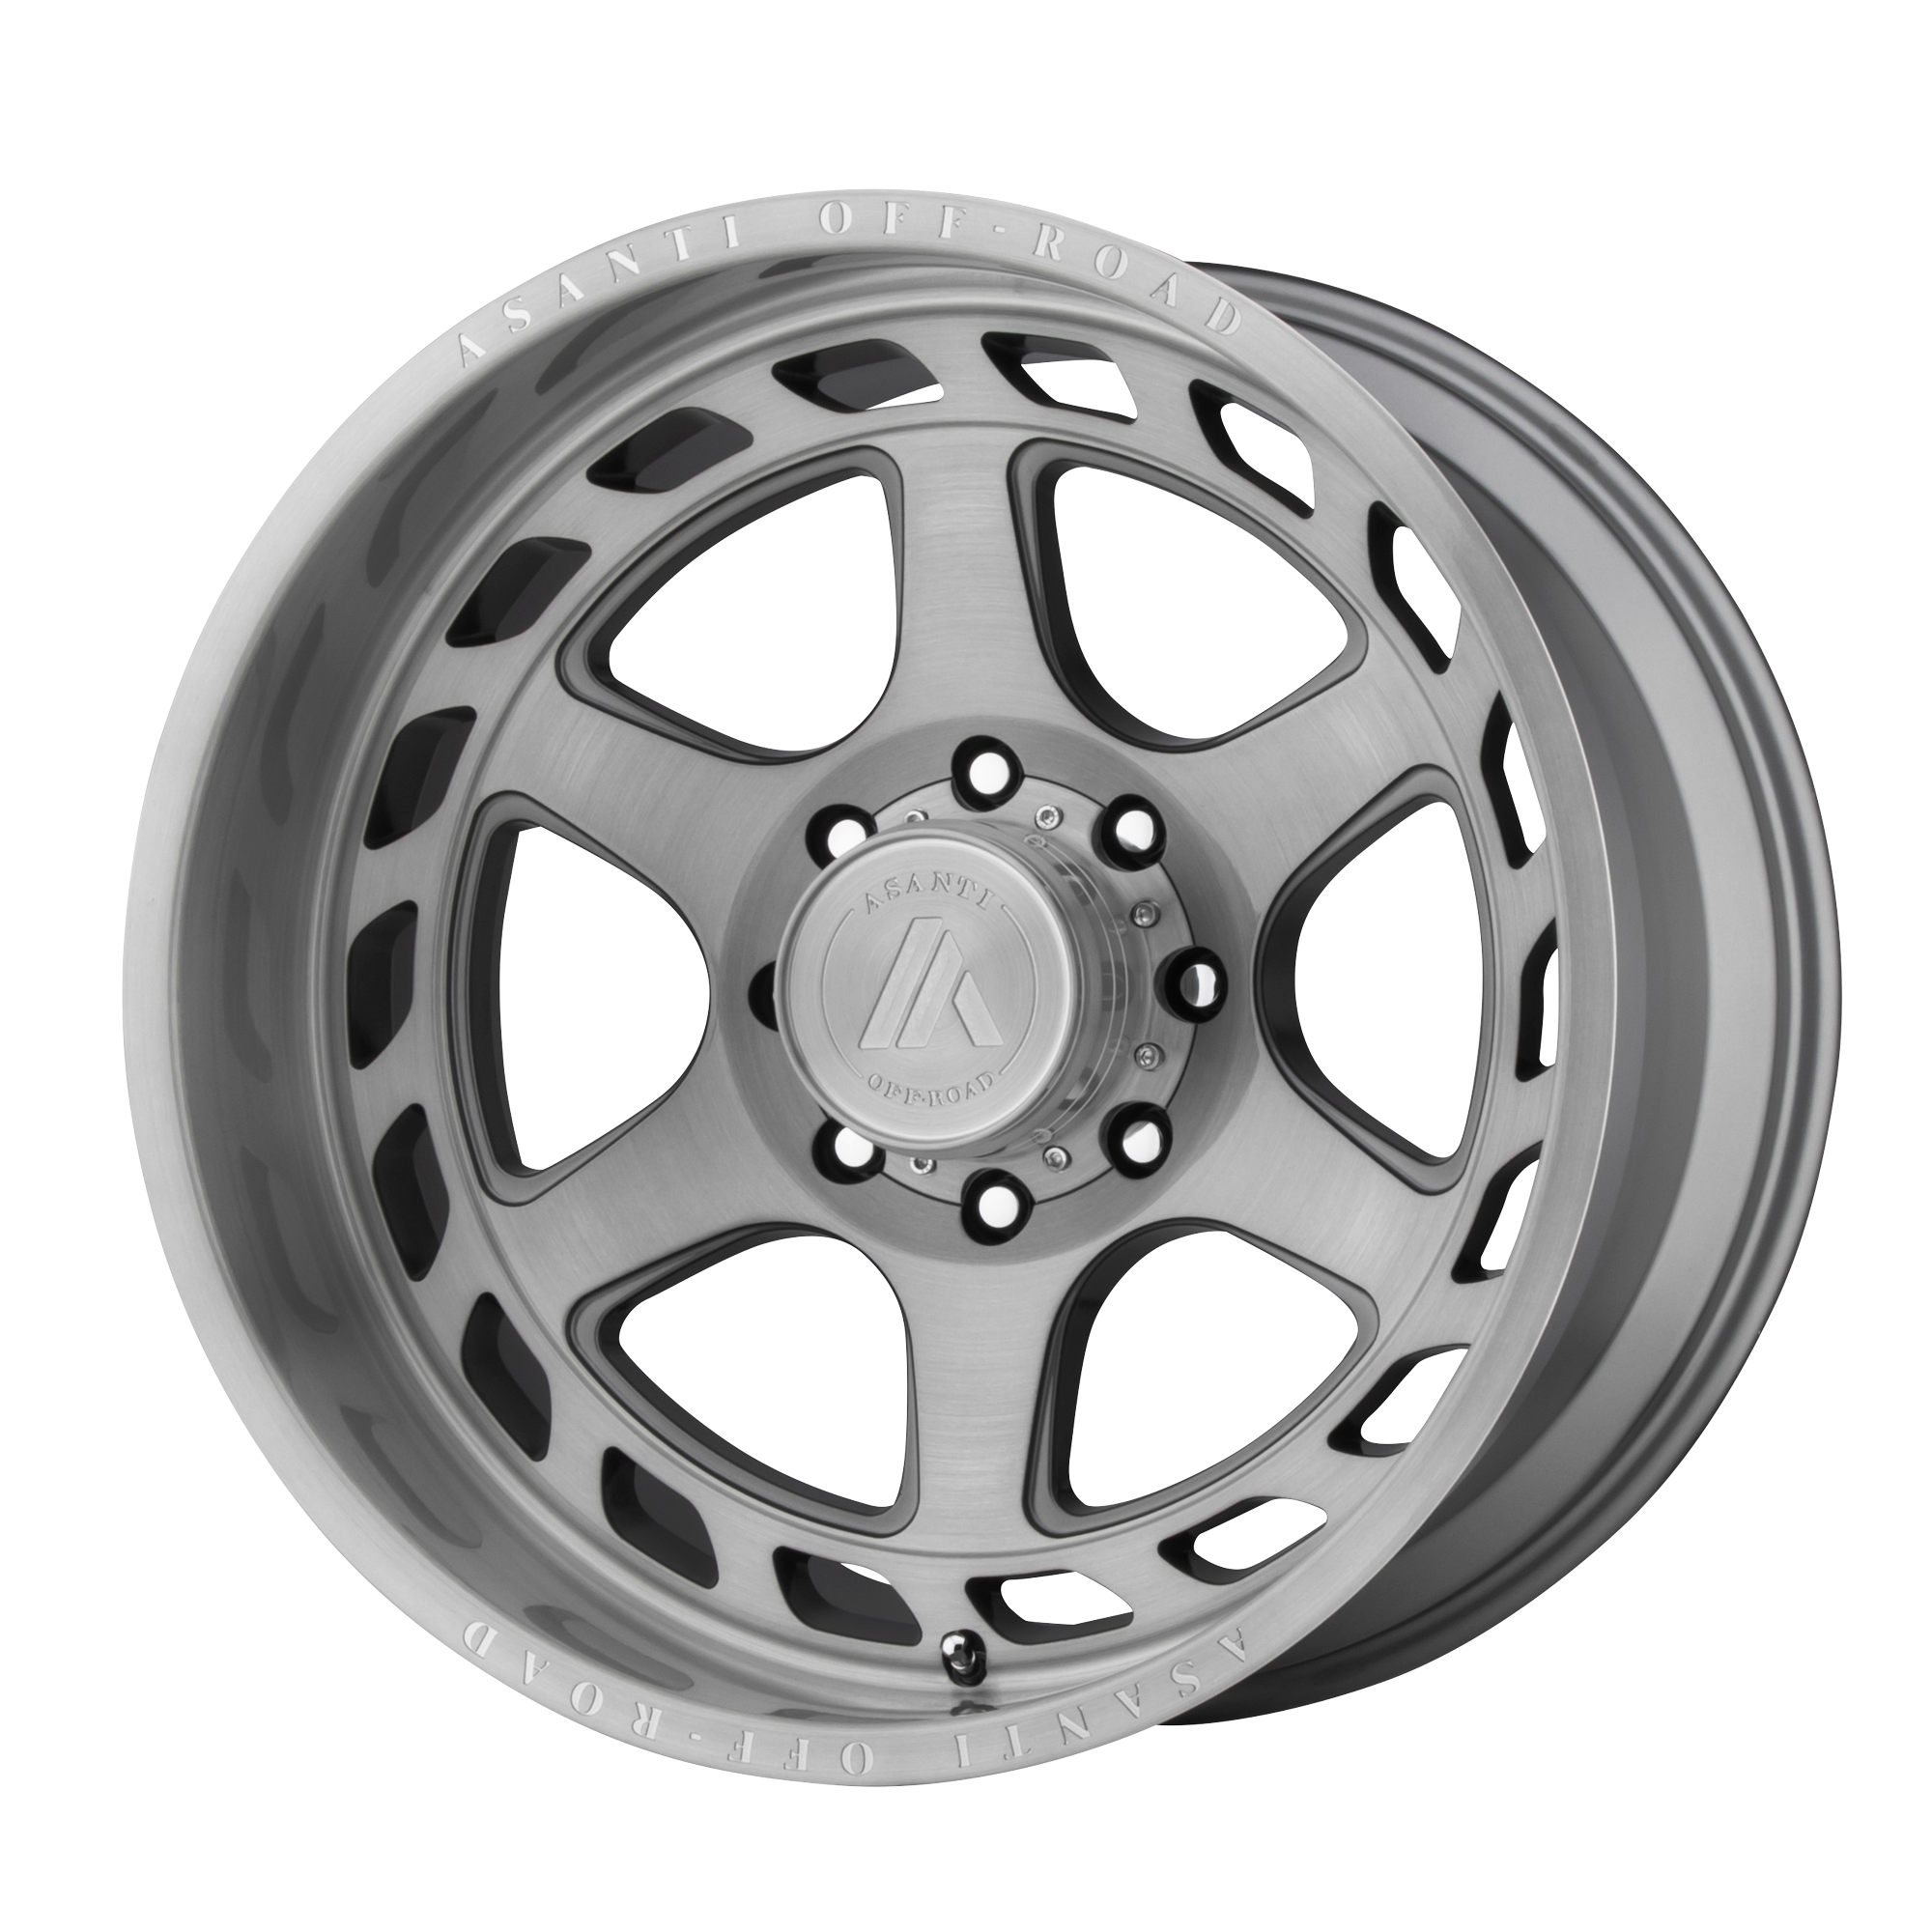 ASANTI OFF ROAD AB816 ANVIL hliníkové disky 10x22 6x135 ET-18 Titanium-Brushed